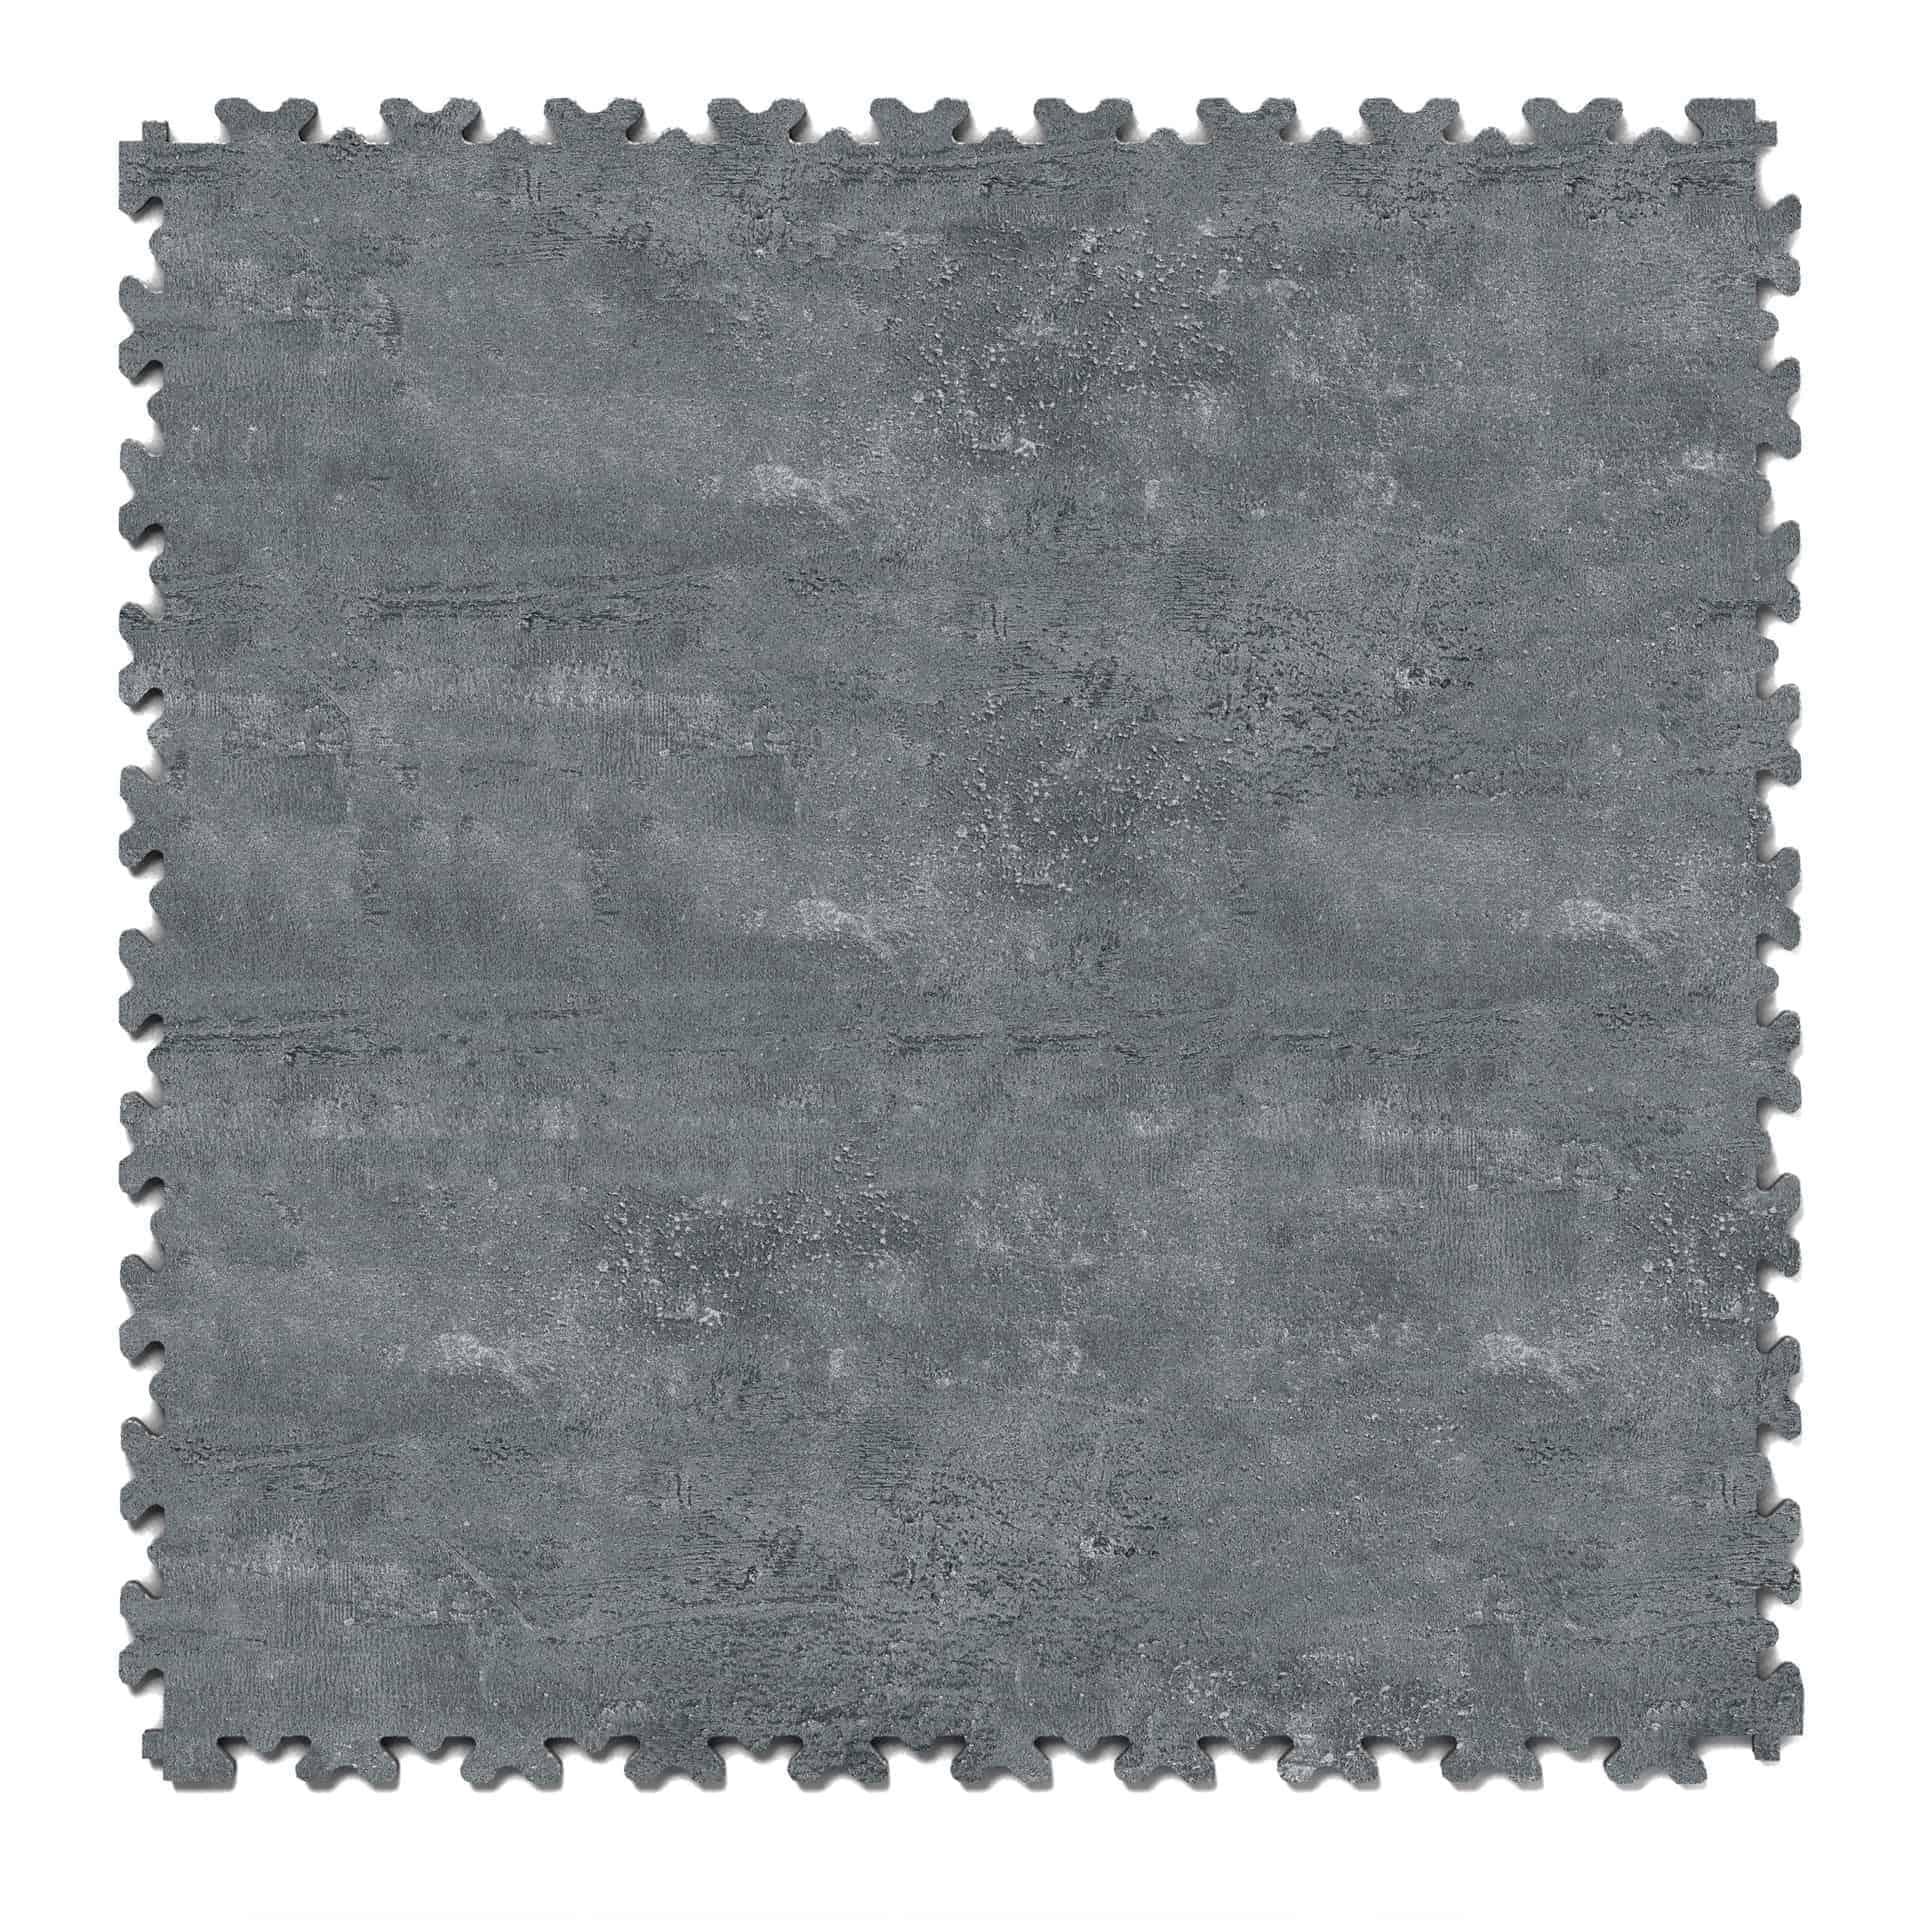 Concrete Dark prints